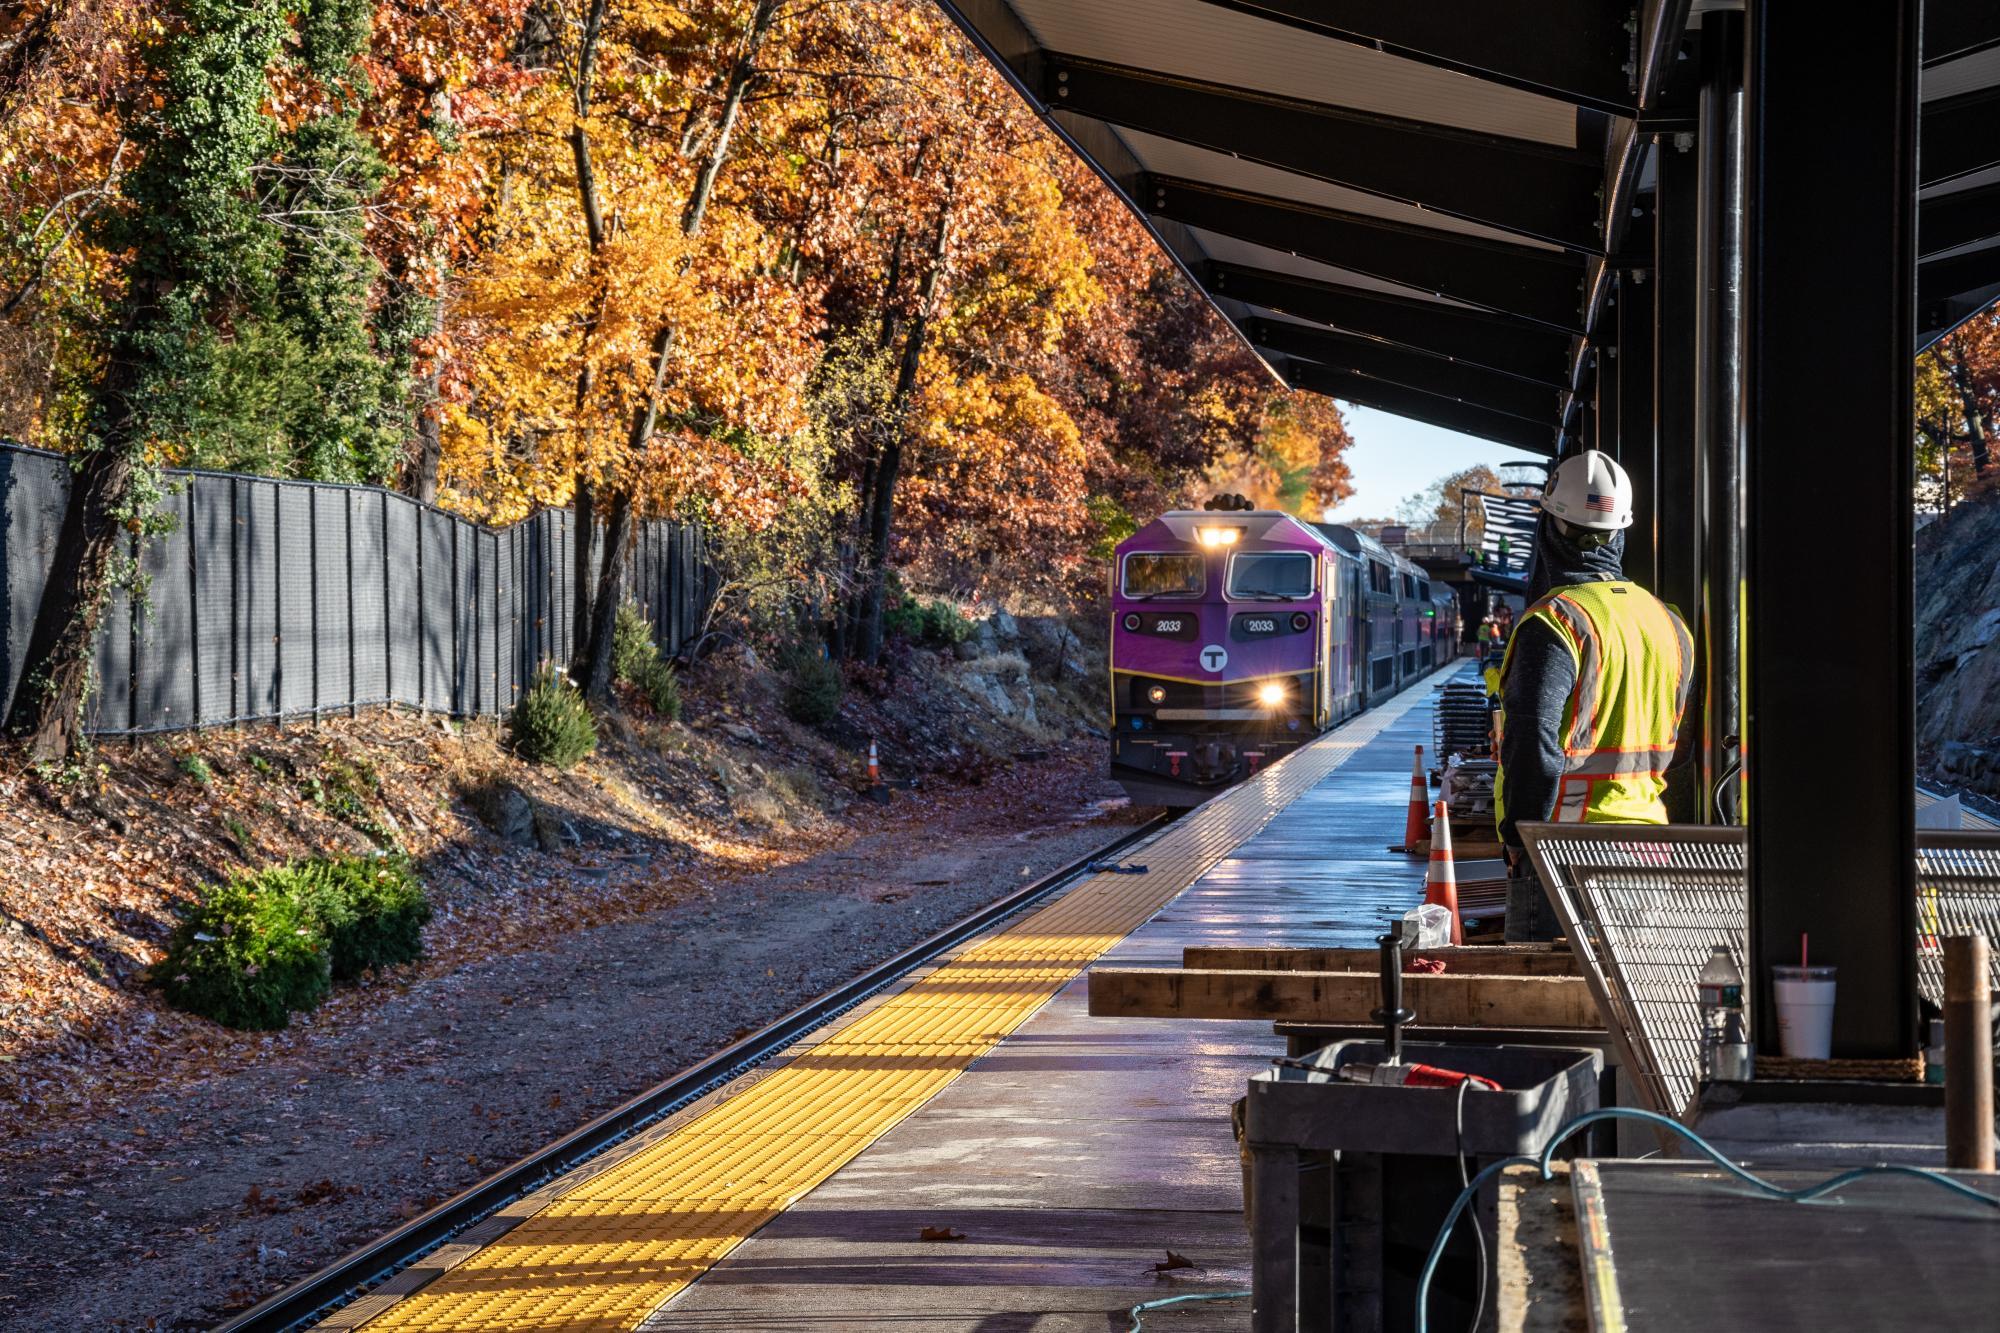 Train approaching platform